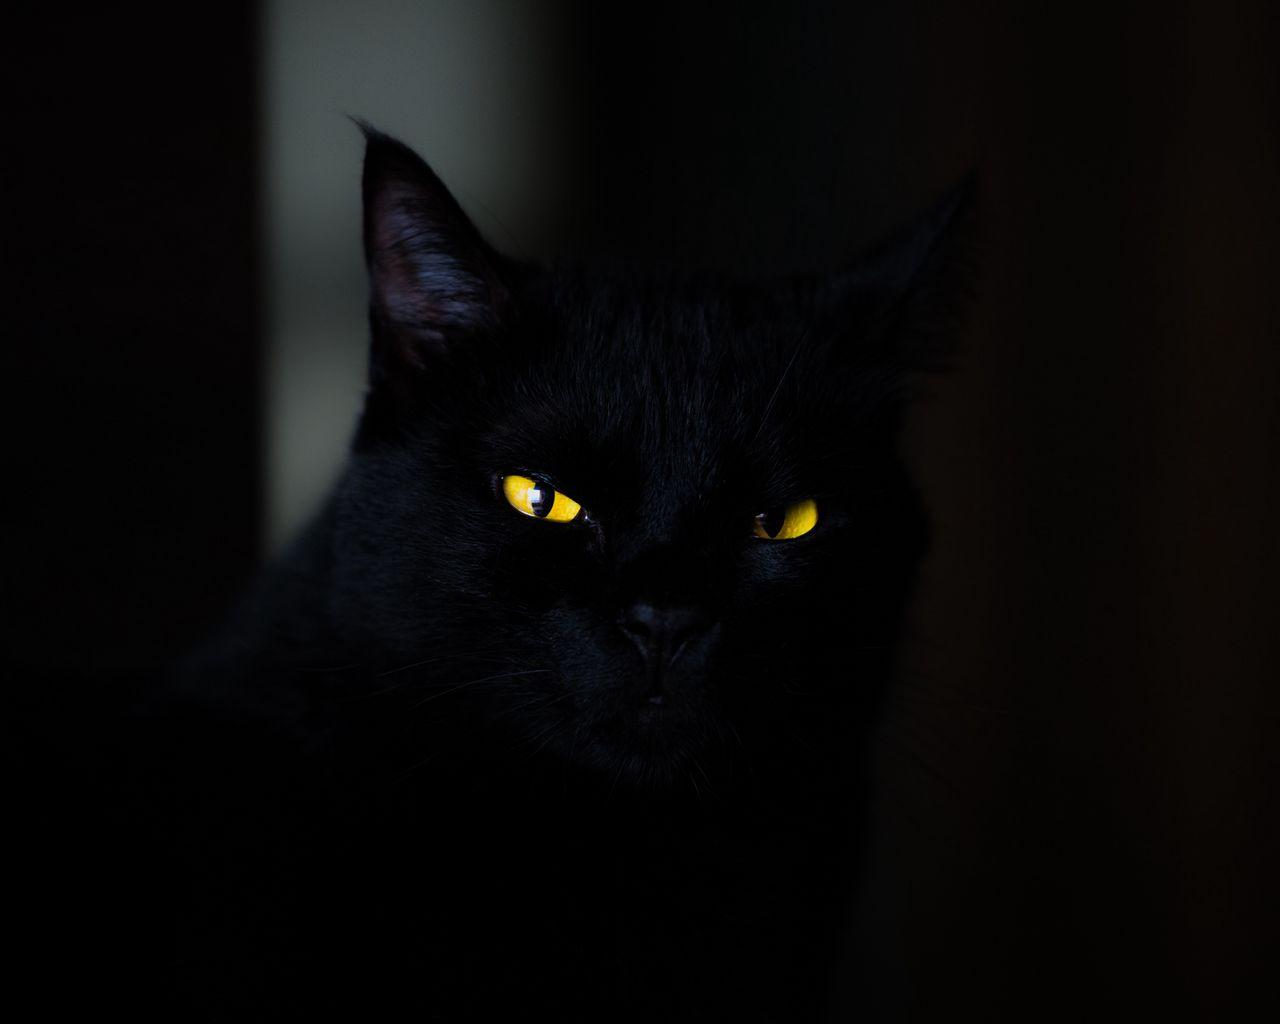 1280x1024 Wallpaper cat, eyes, black